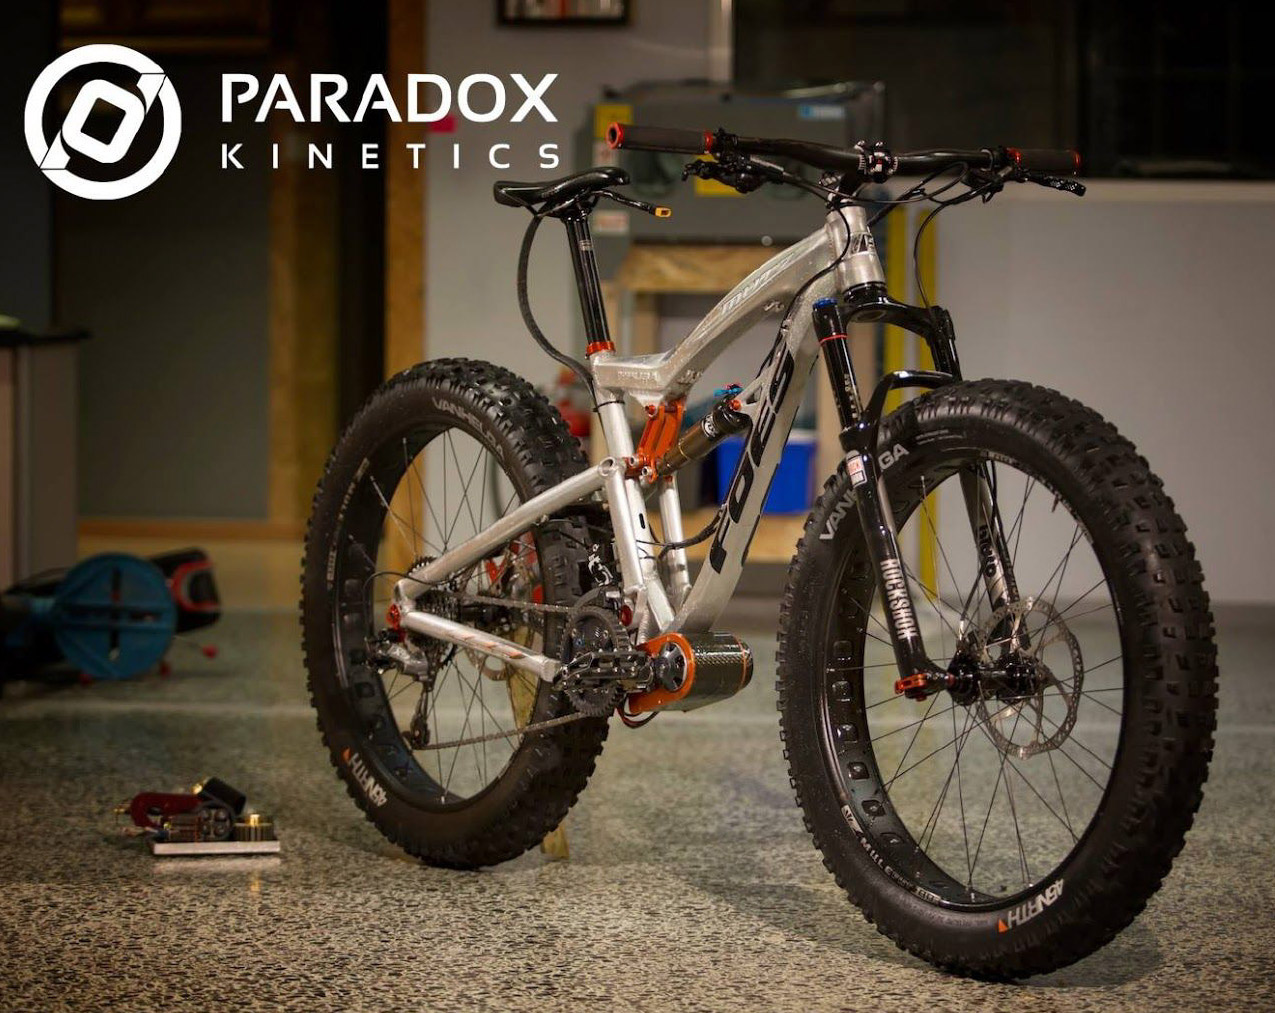 paradox-kinetics_bike_3a-1.jpg